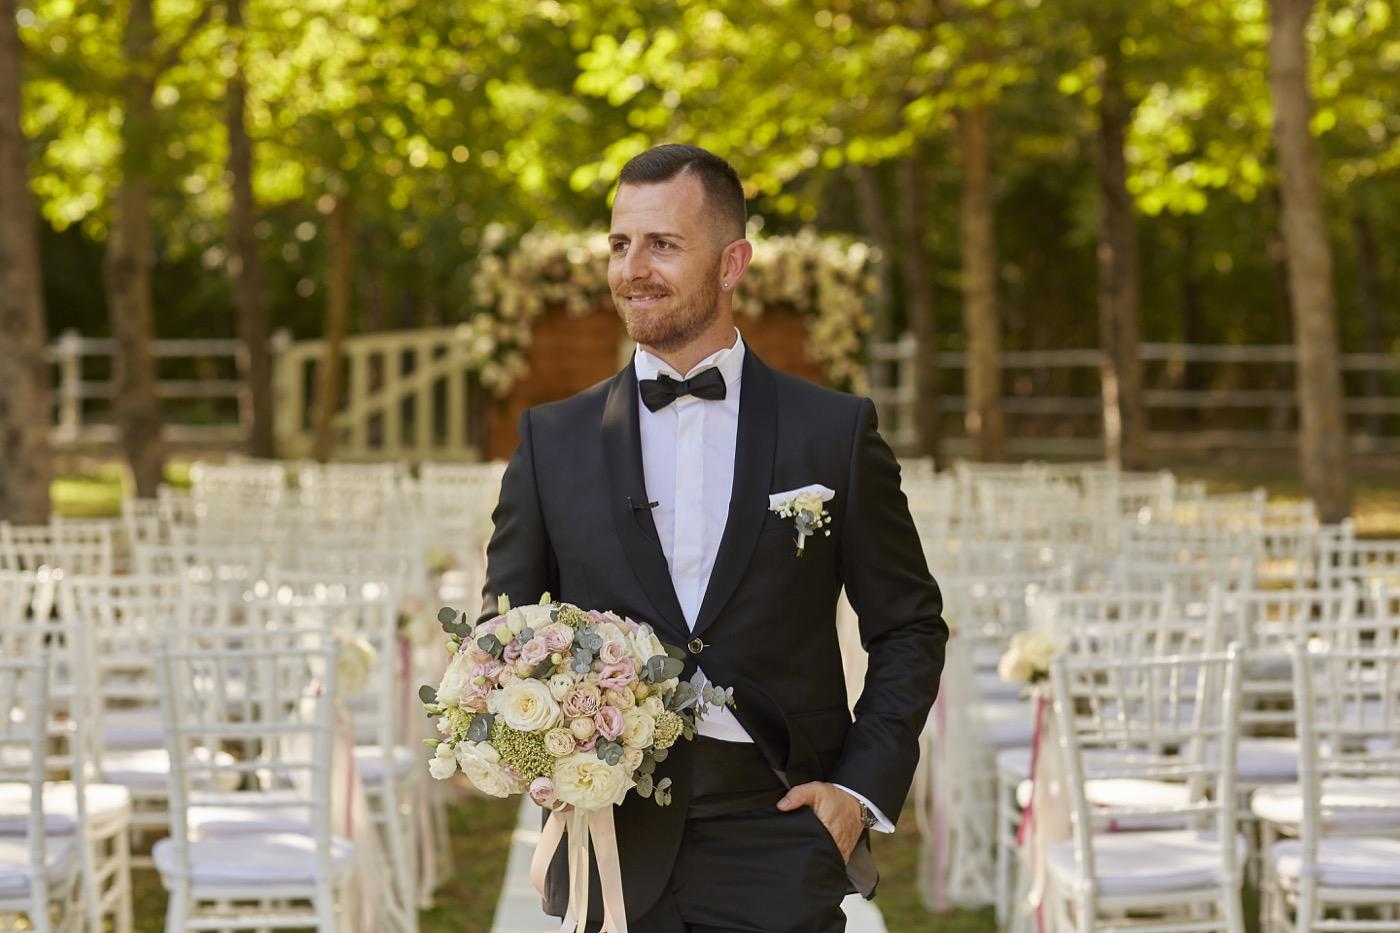 Claudio-Coppola-wedding-photographer-la-scuderia-eventi-preparativi-la-rosetta-perugia-40